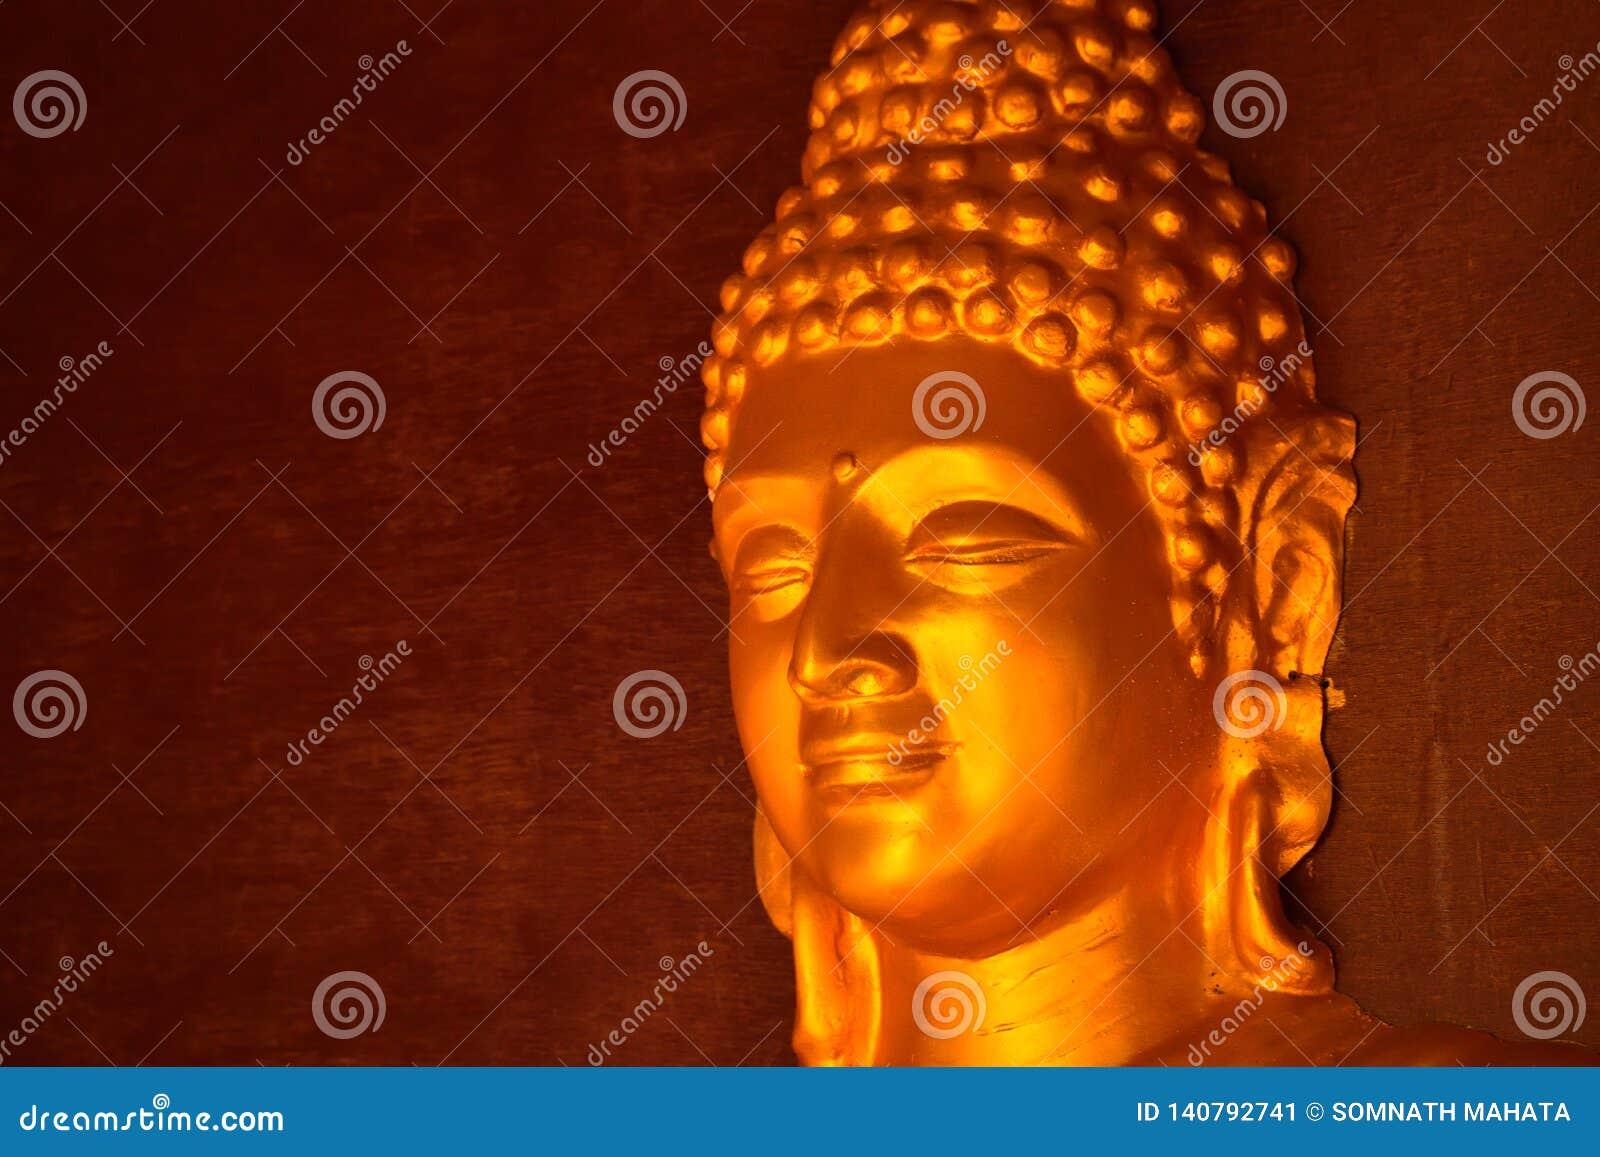 Goldenes farbiges Idol von Lord Buddha